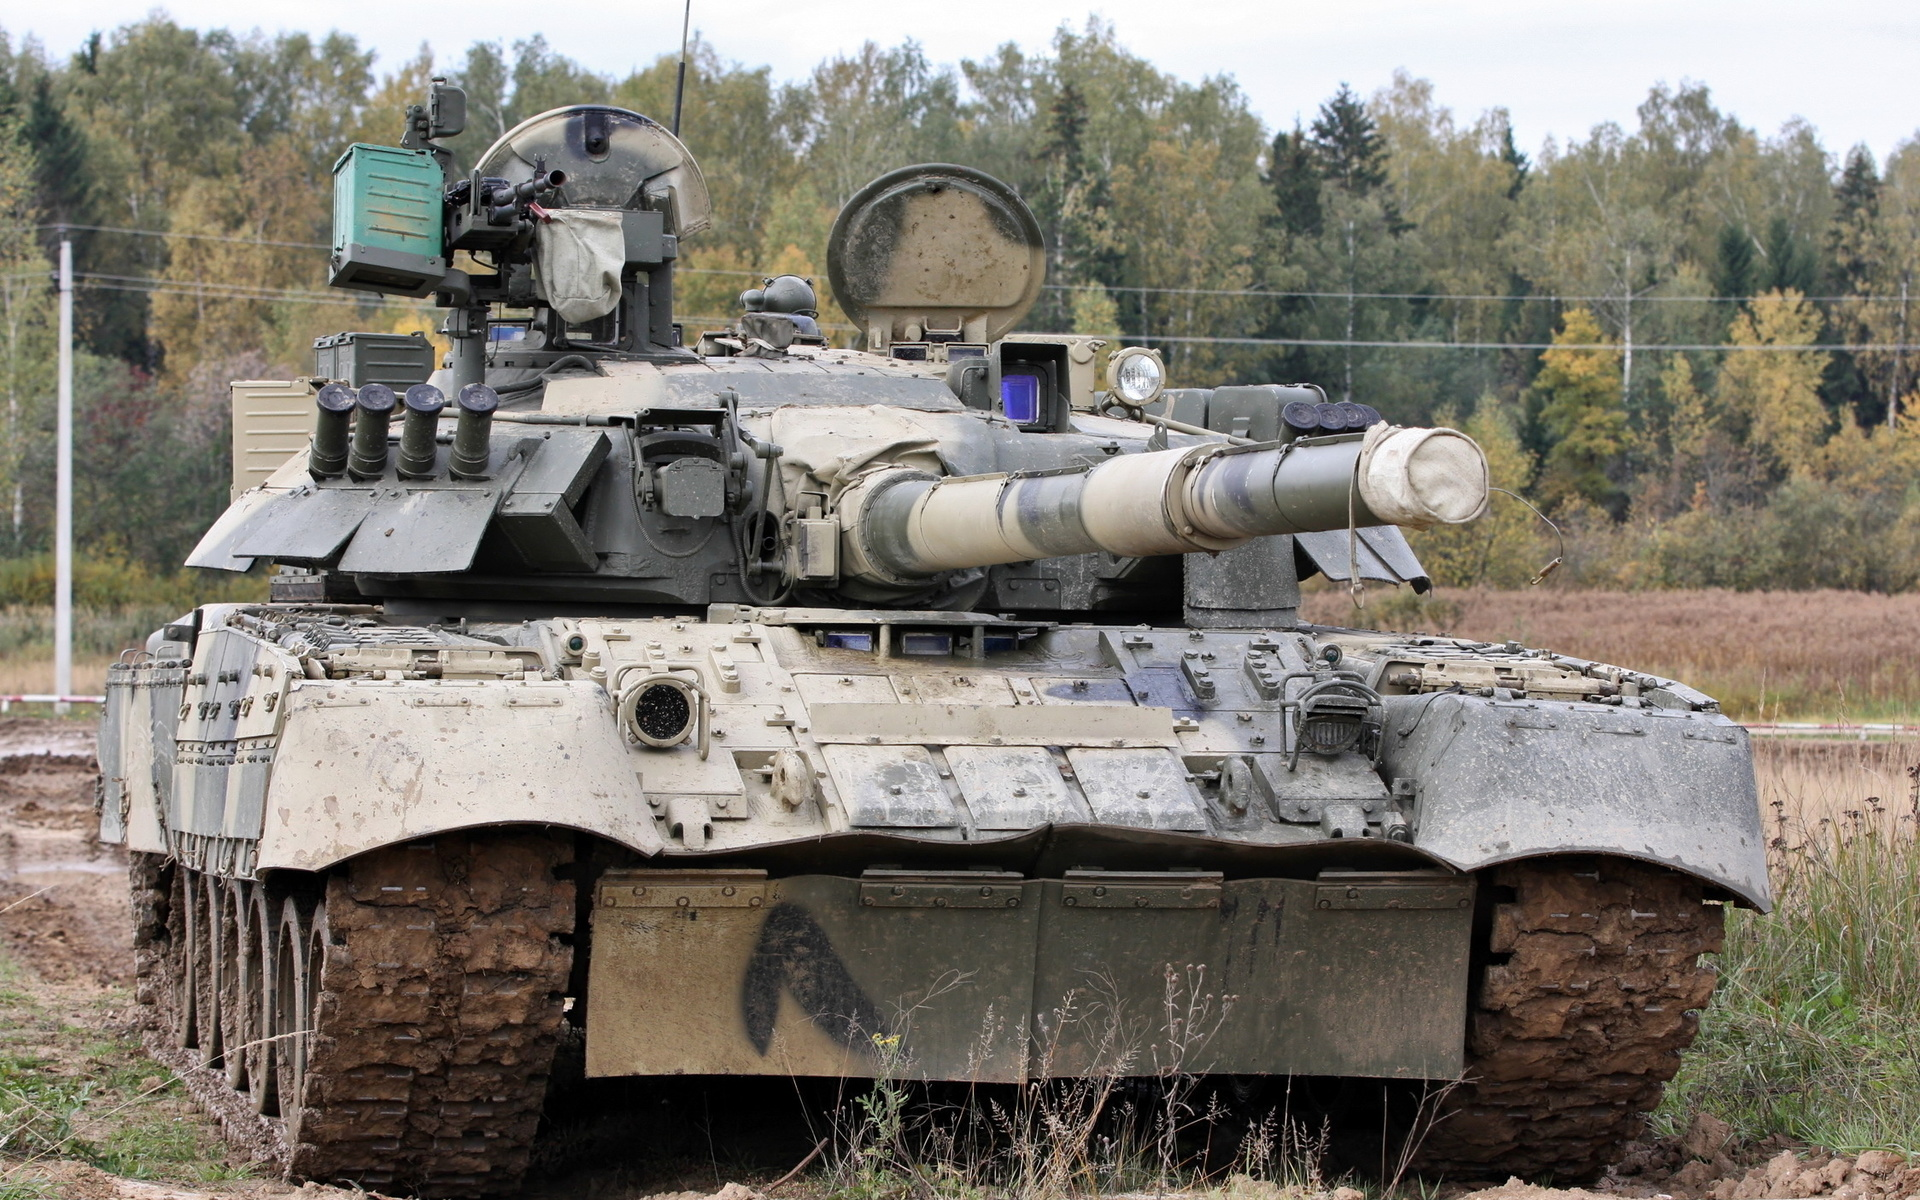 танки крупный план фото - 11